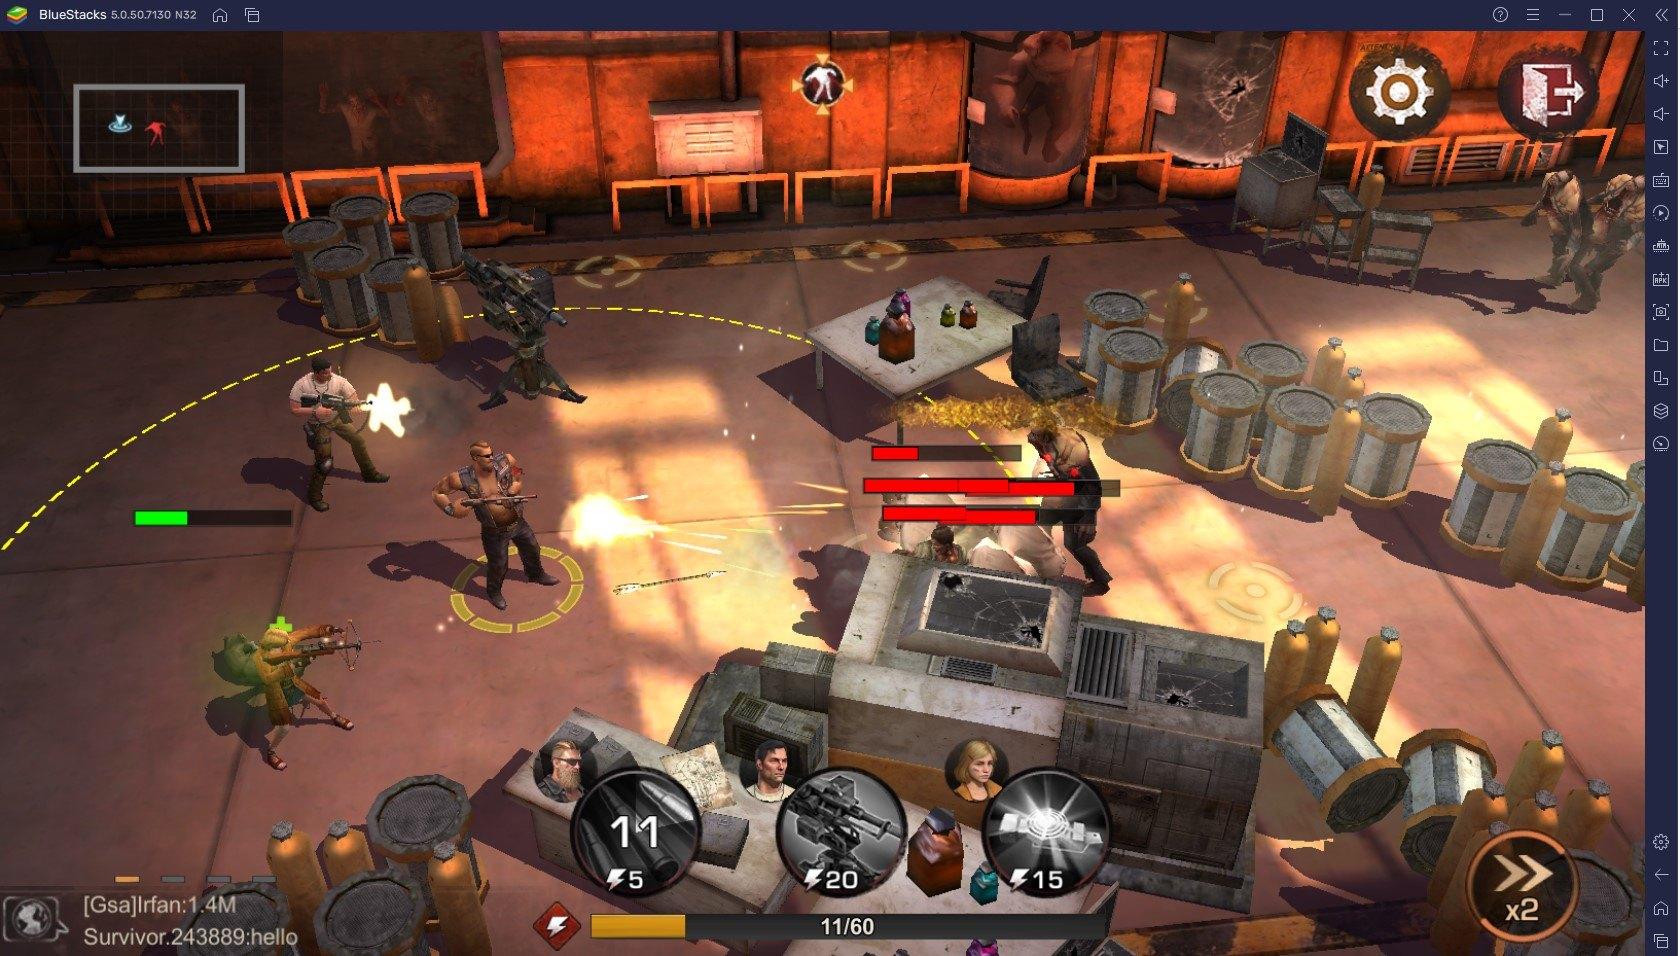 S.O.S: 스테이트 오브 서바이벌 워킹 데드 콜라보 진행, 대릴 딕슨을 블루스택 앱플레이어로 PC에서 만나봐요